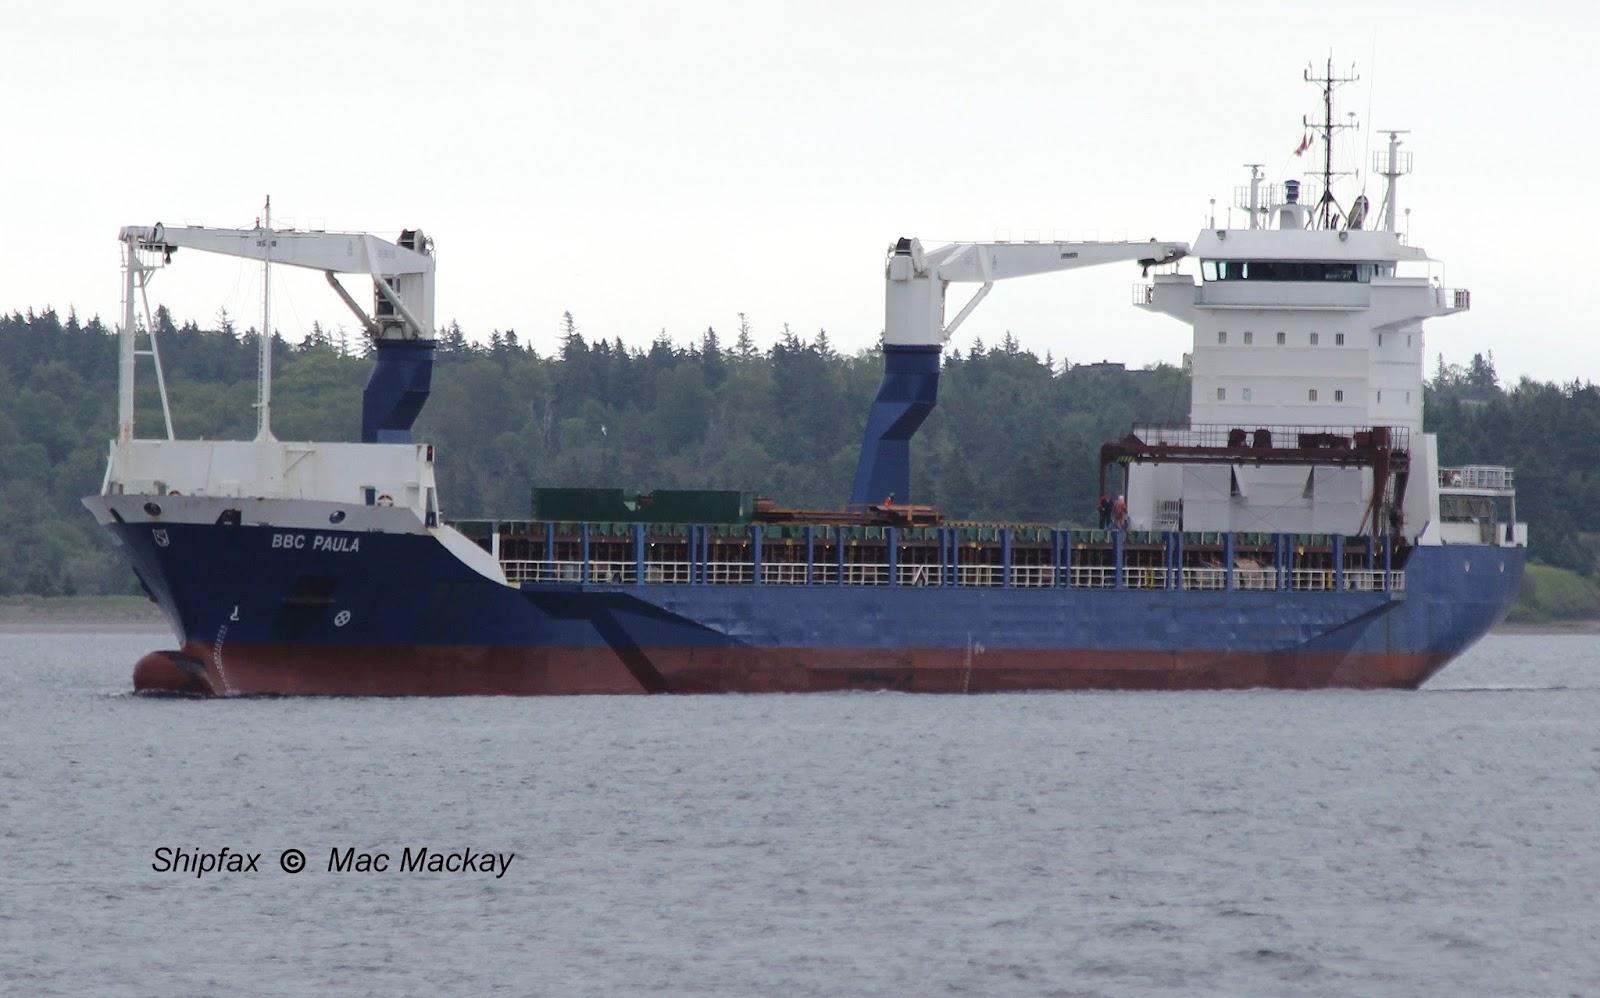 Shipfax: June 2016